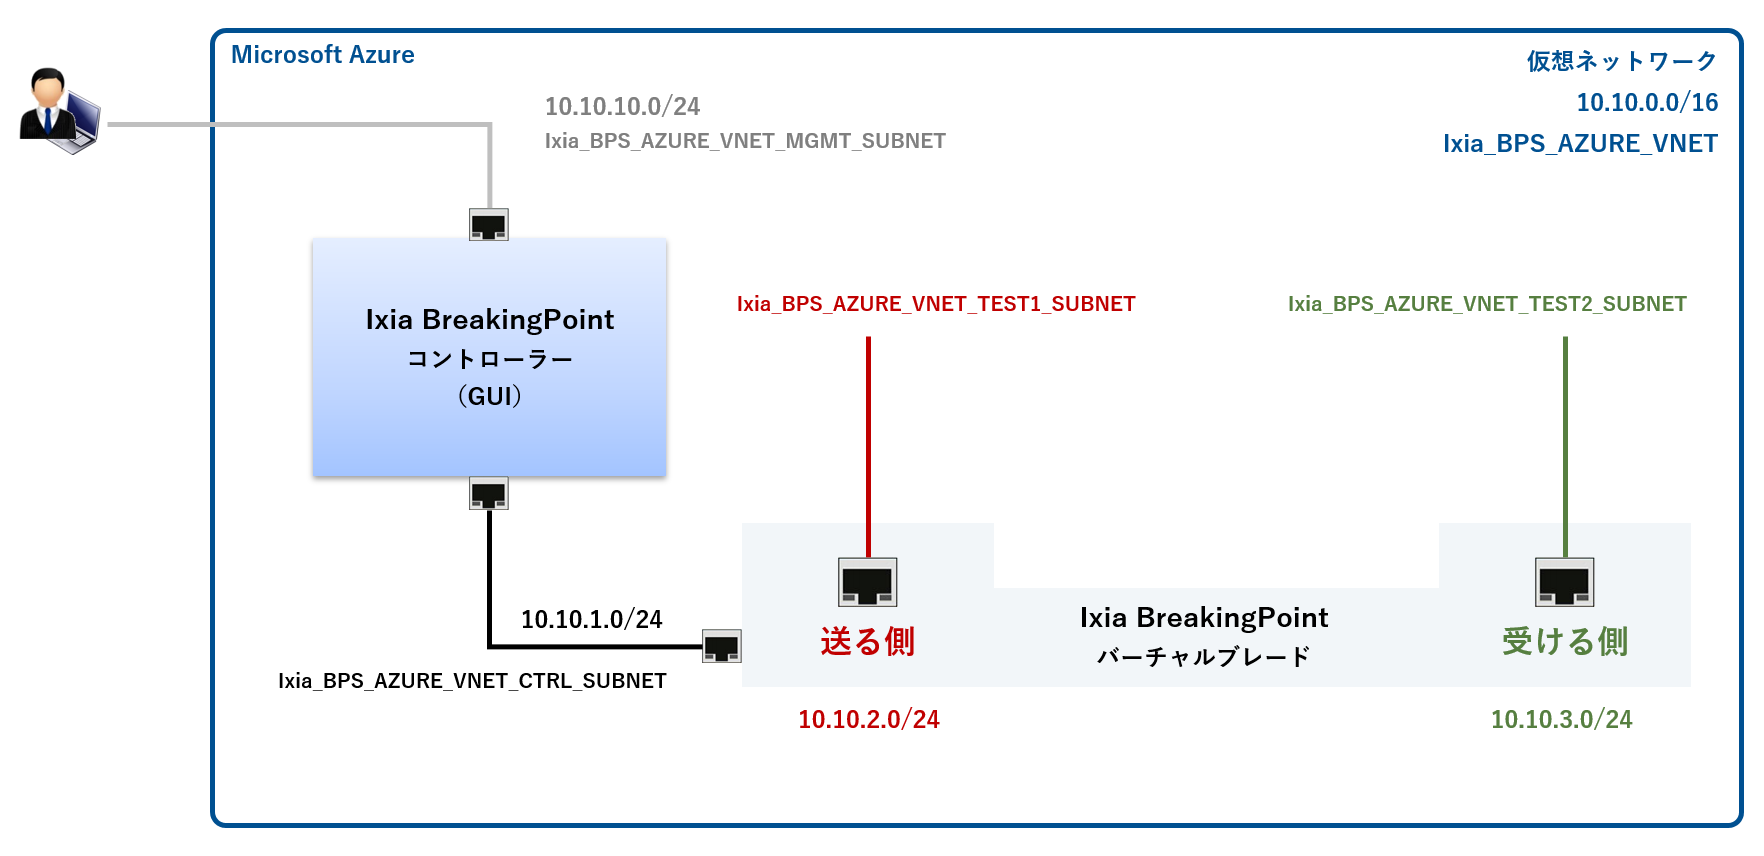 Microsoftonline 拒否 接続 まし が login で com た され